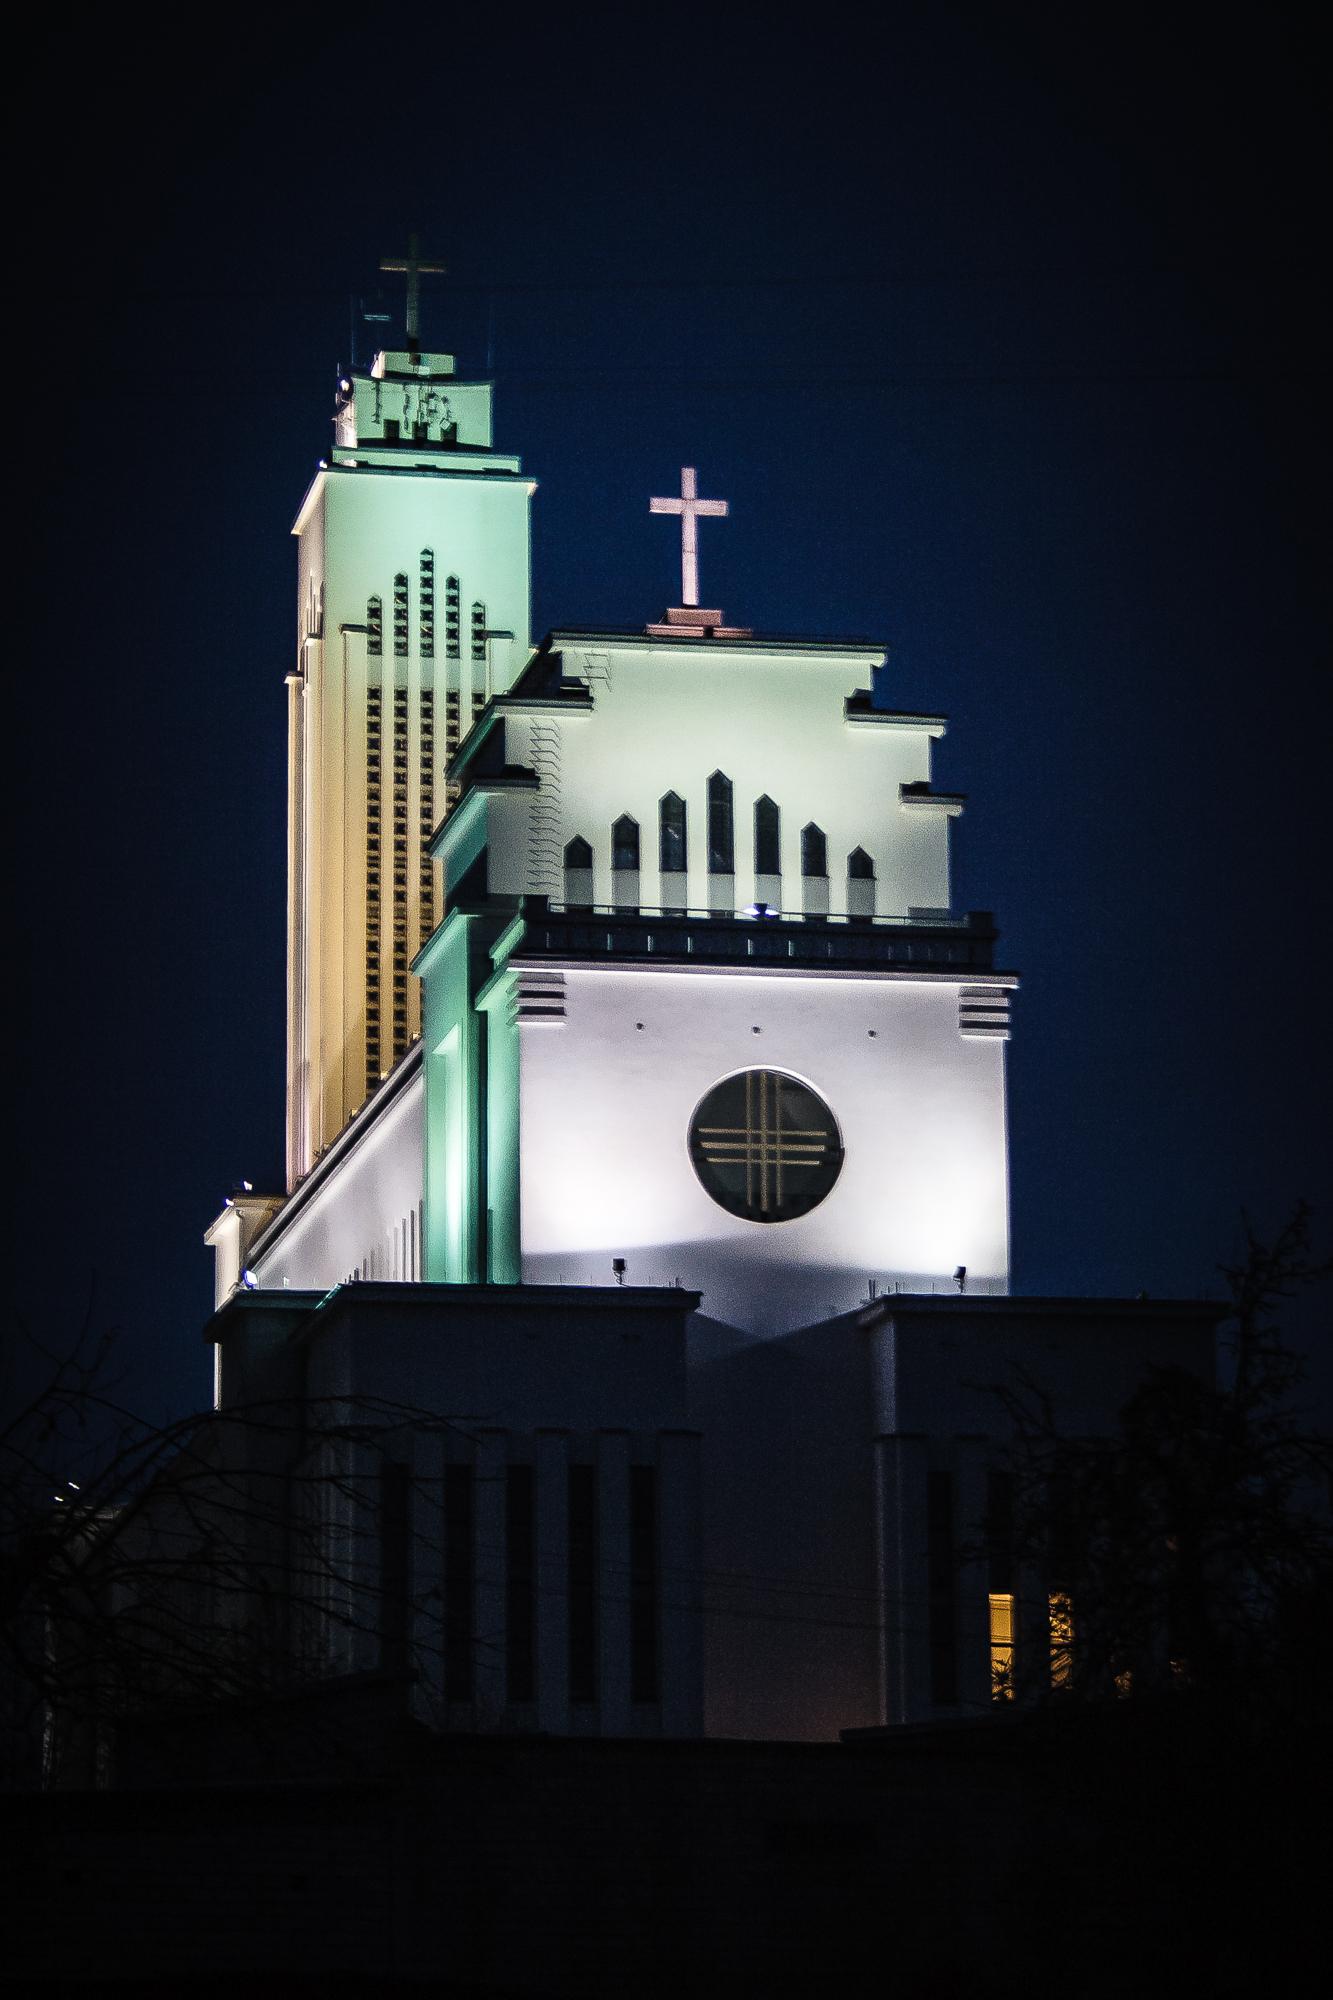 Christs Resurrection Church At Night Via @Atisgailis